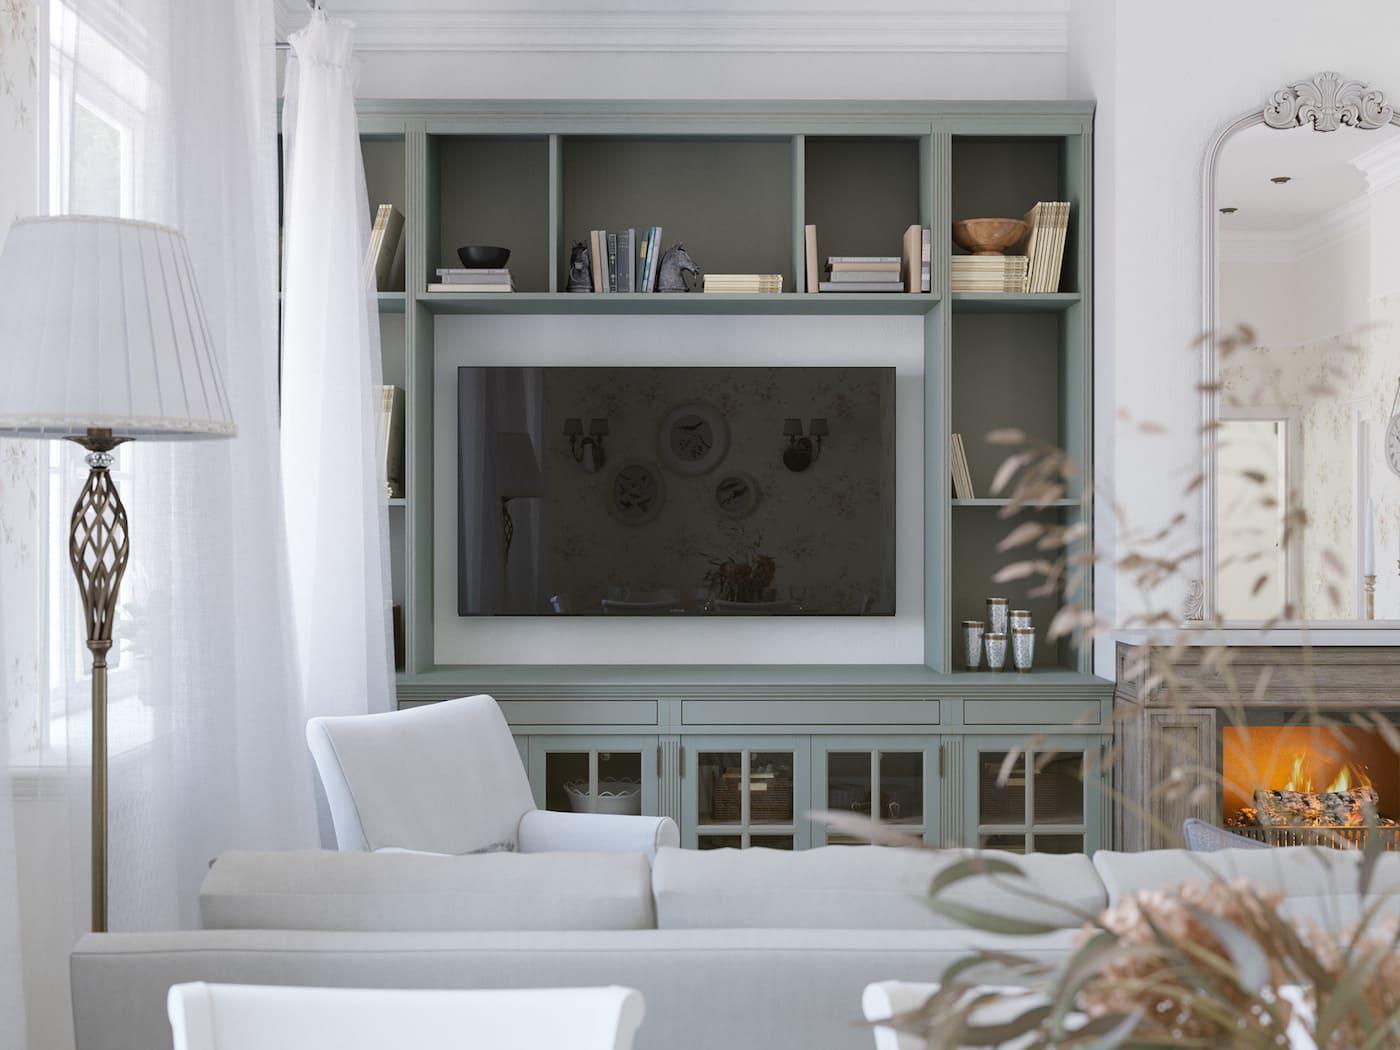 модный дизайн интерьера квартиры фото 44